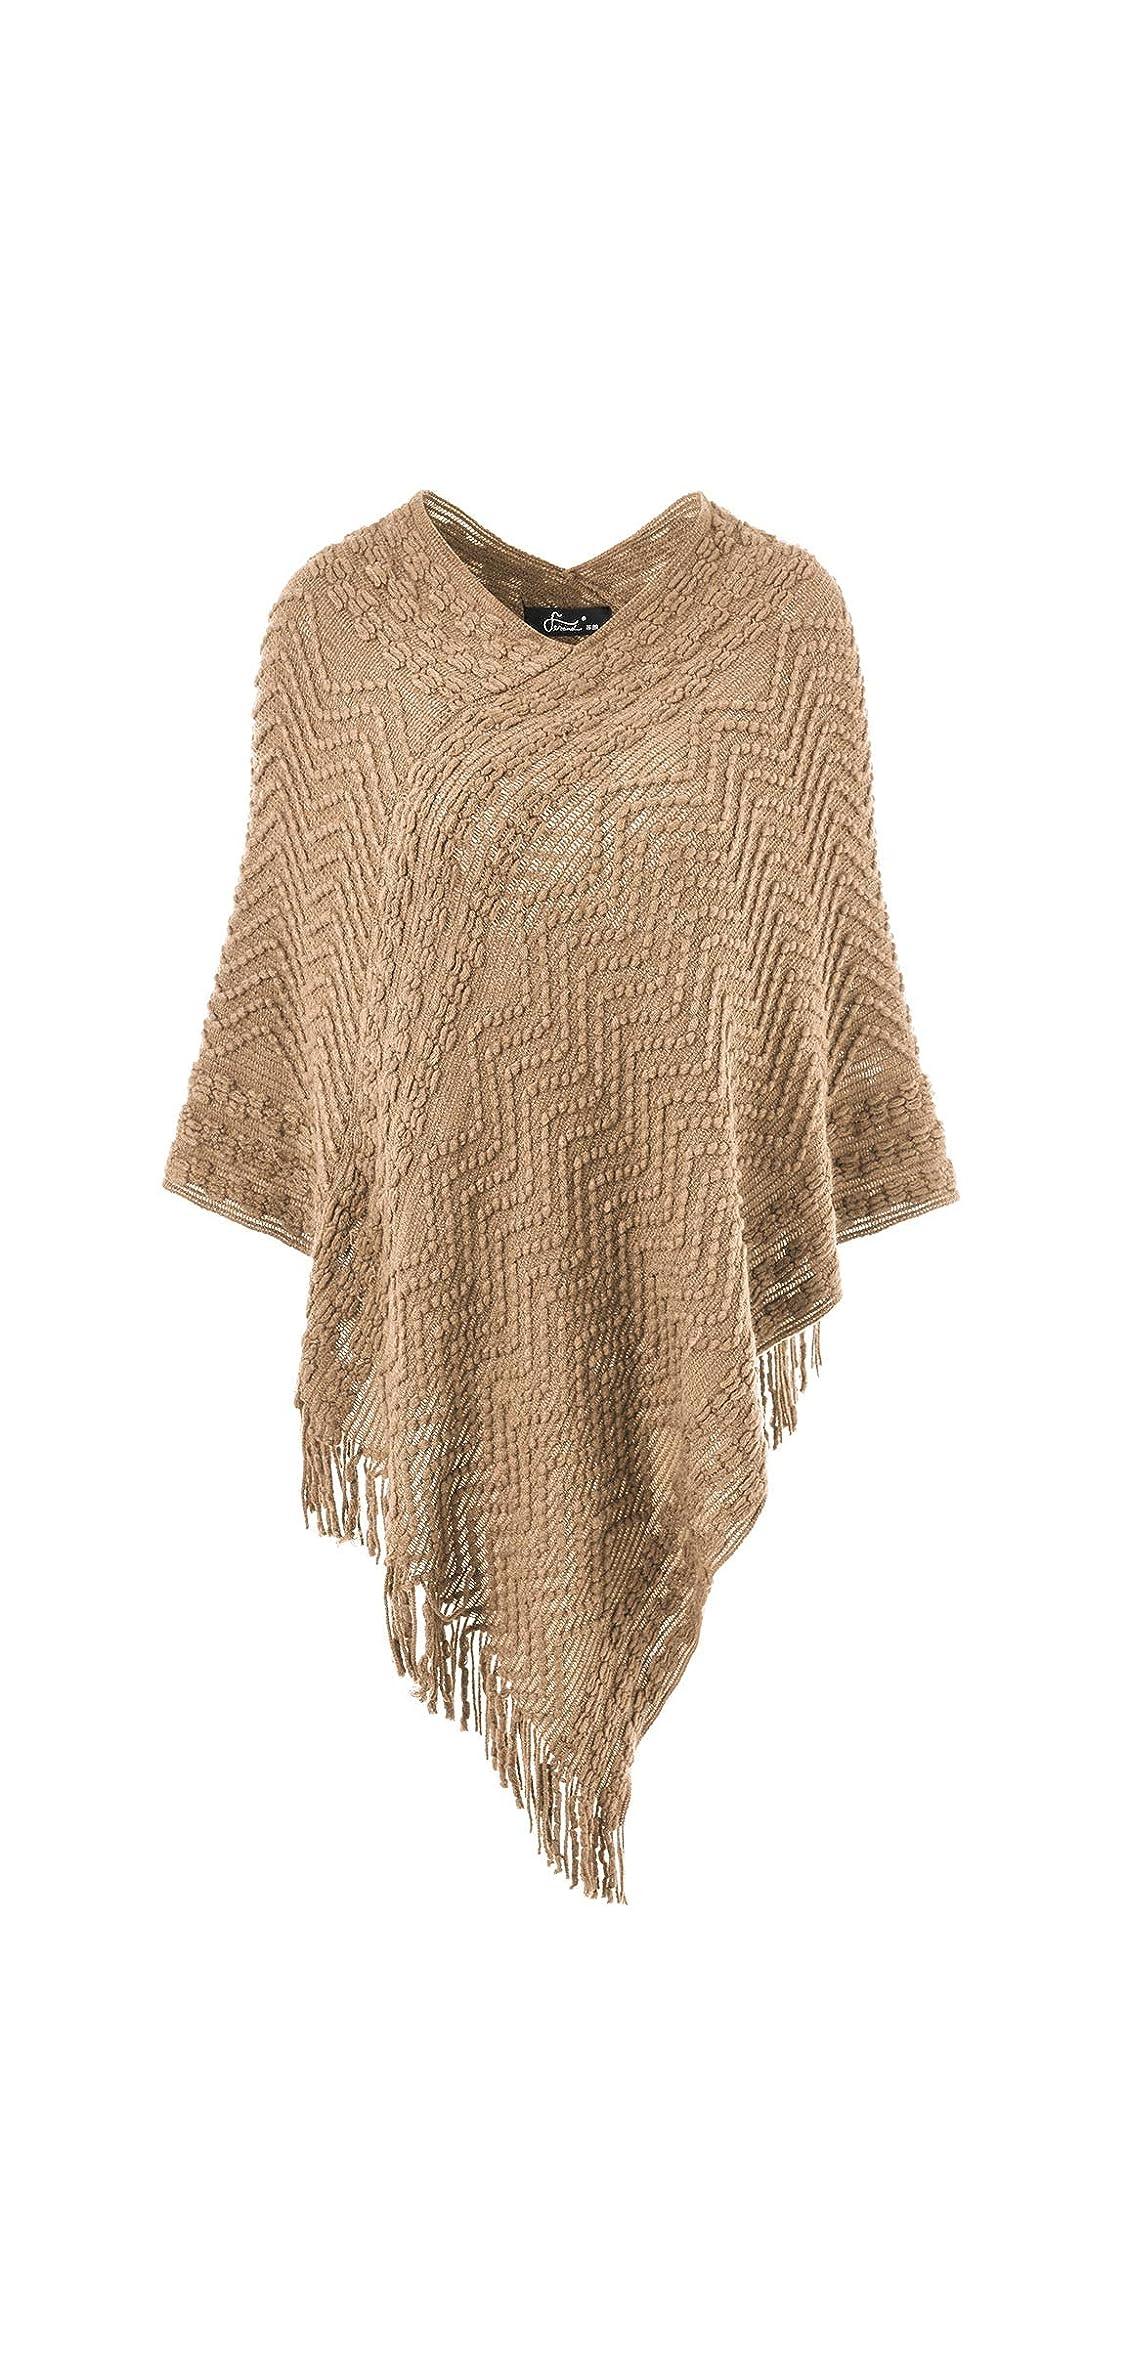 Women's Elegant Cozy Poncho Sweater With Chevron Stripes